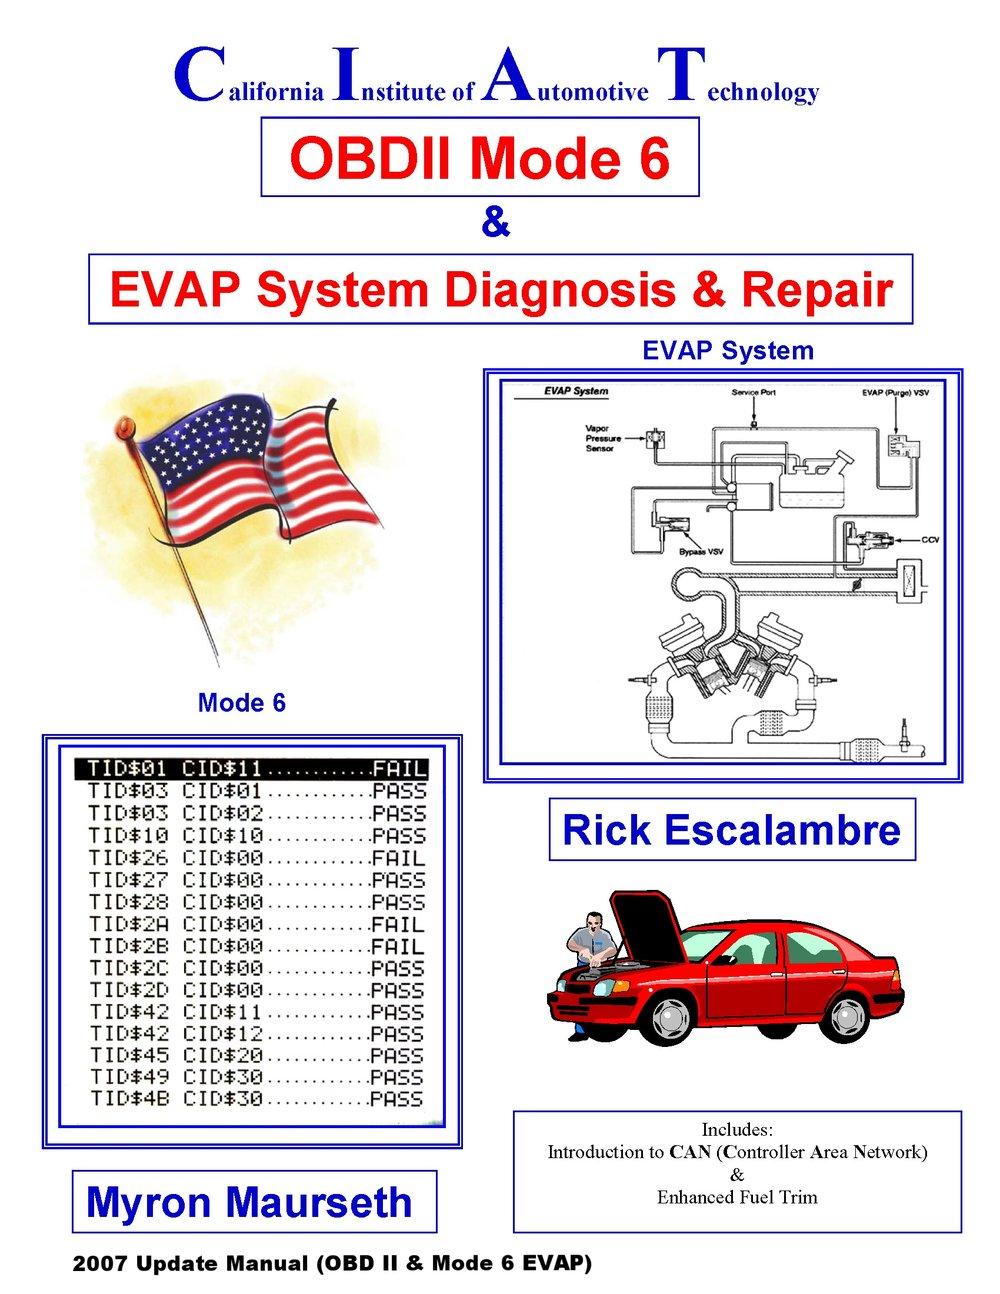 2007_Update_Manual_Cover.jpg